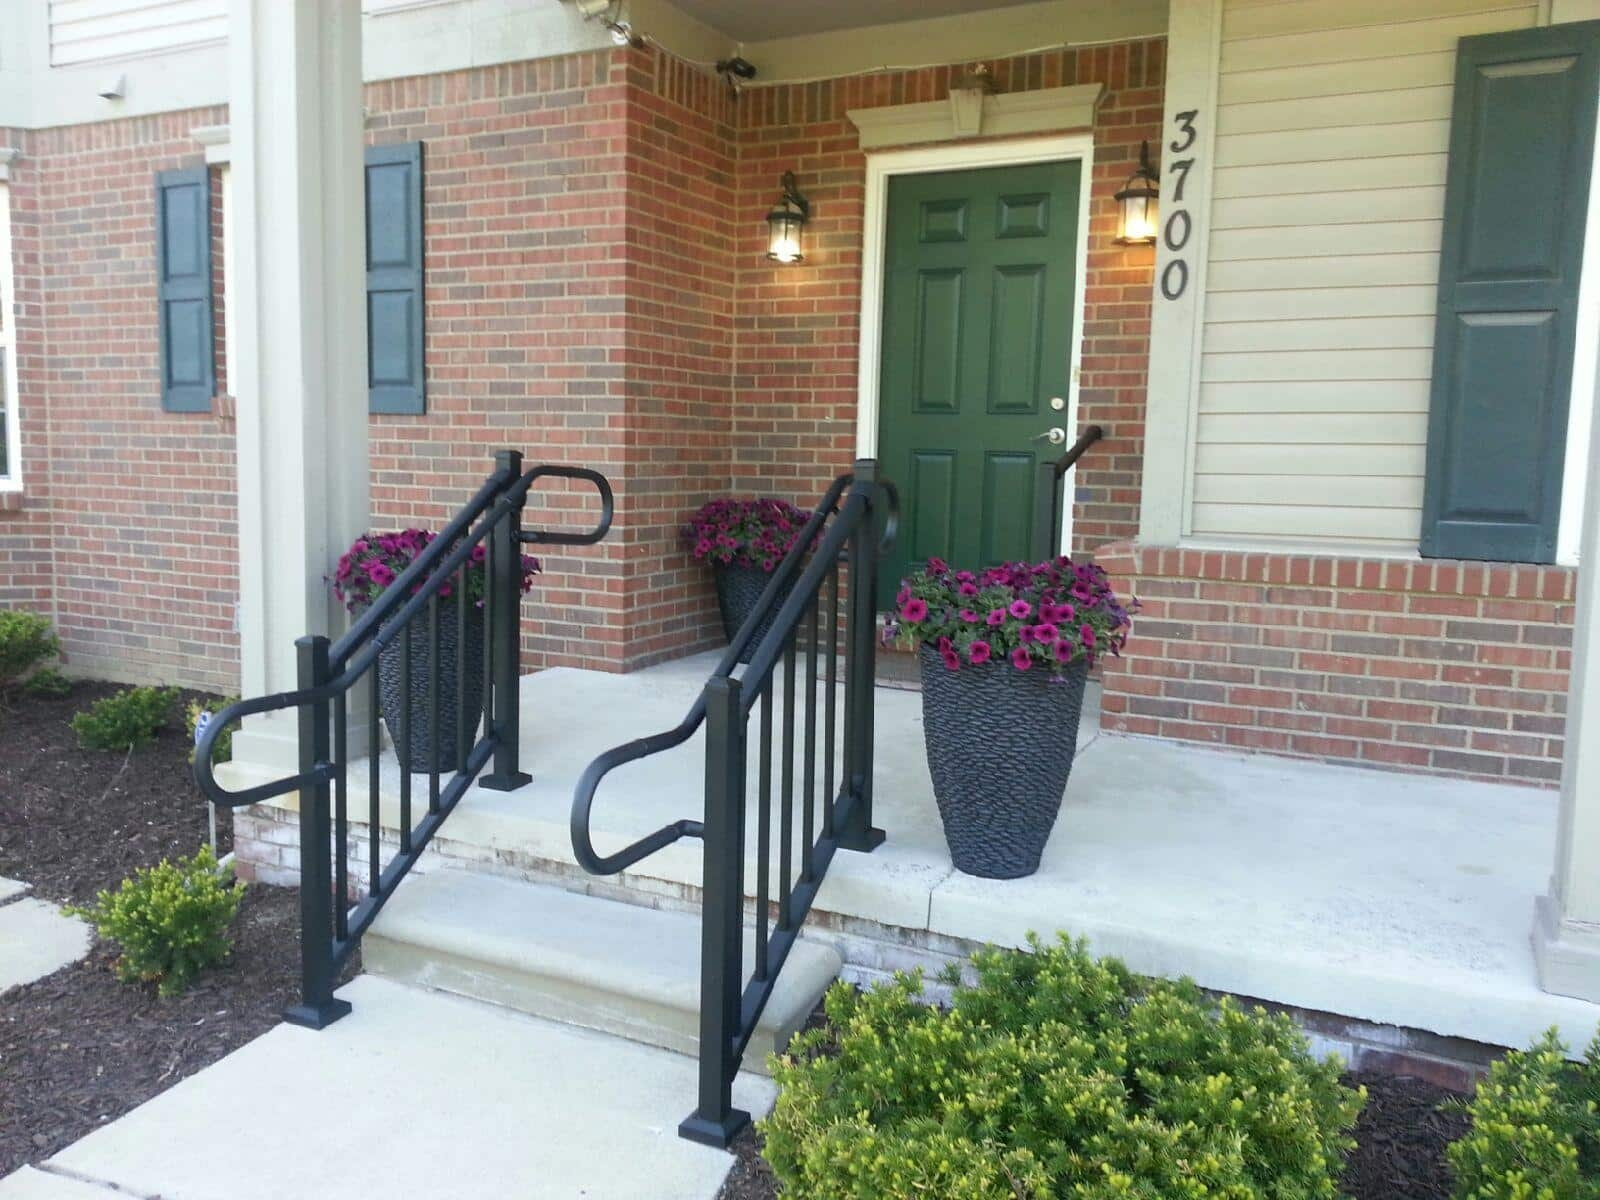 The Proper Handrail Height Aluminum Handrail Direct | Ada Compliant Exterior Handrails | Stainless Steel | Deck Railing | Extension | Vinyl | Hand Rail